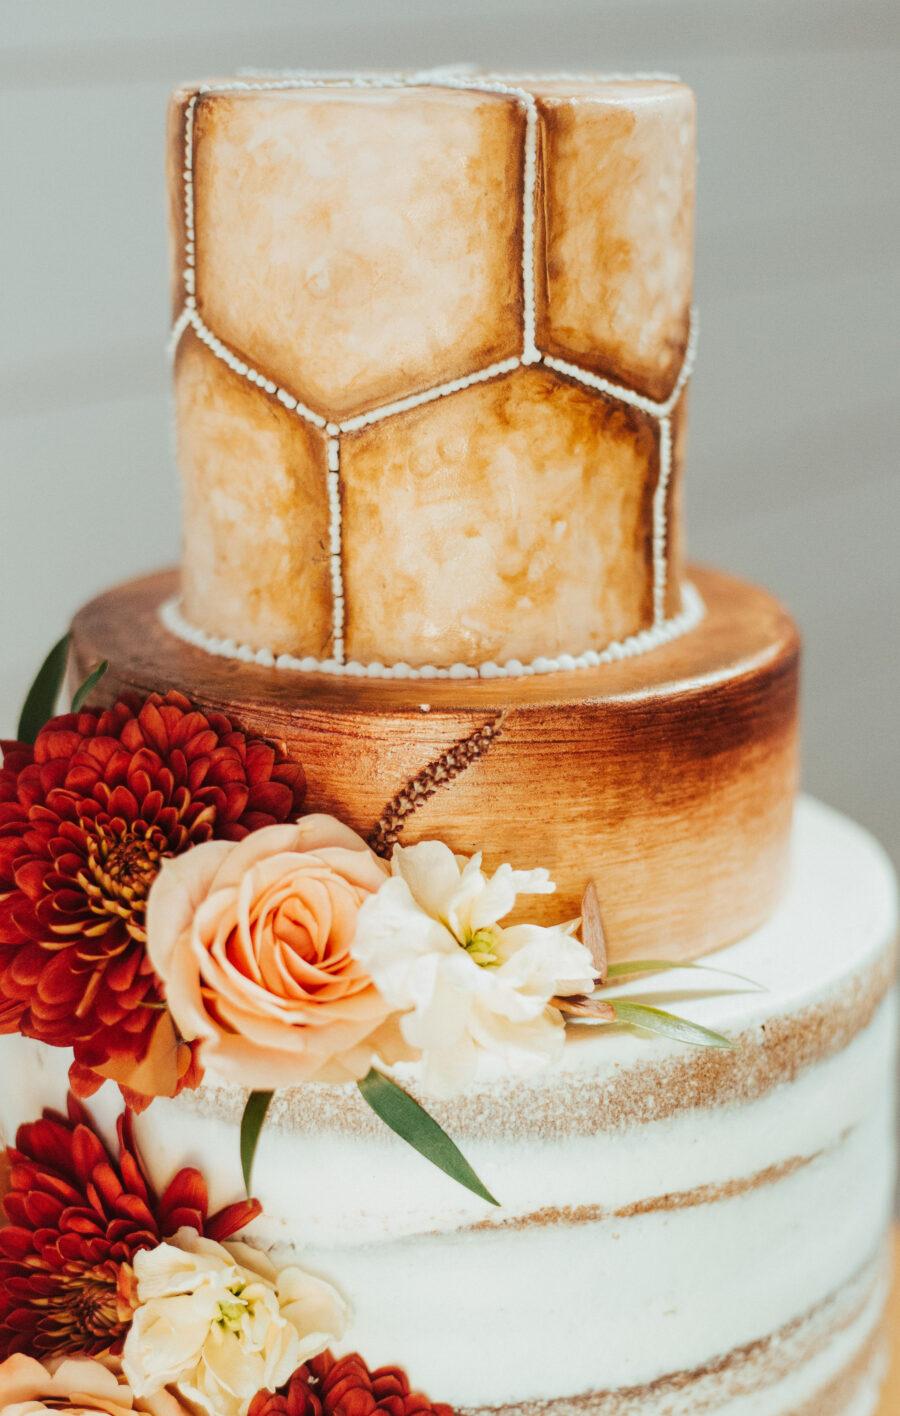 Boho wedding cake design: Bright Bohemian Photo Shoot from Ina J Designs